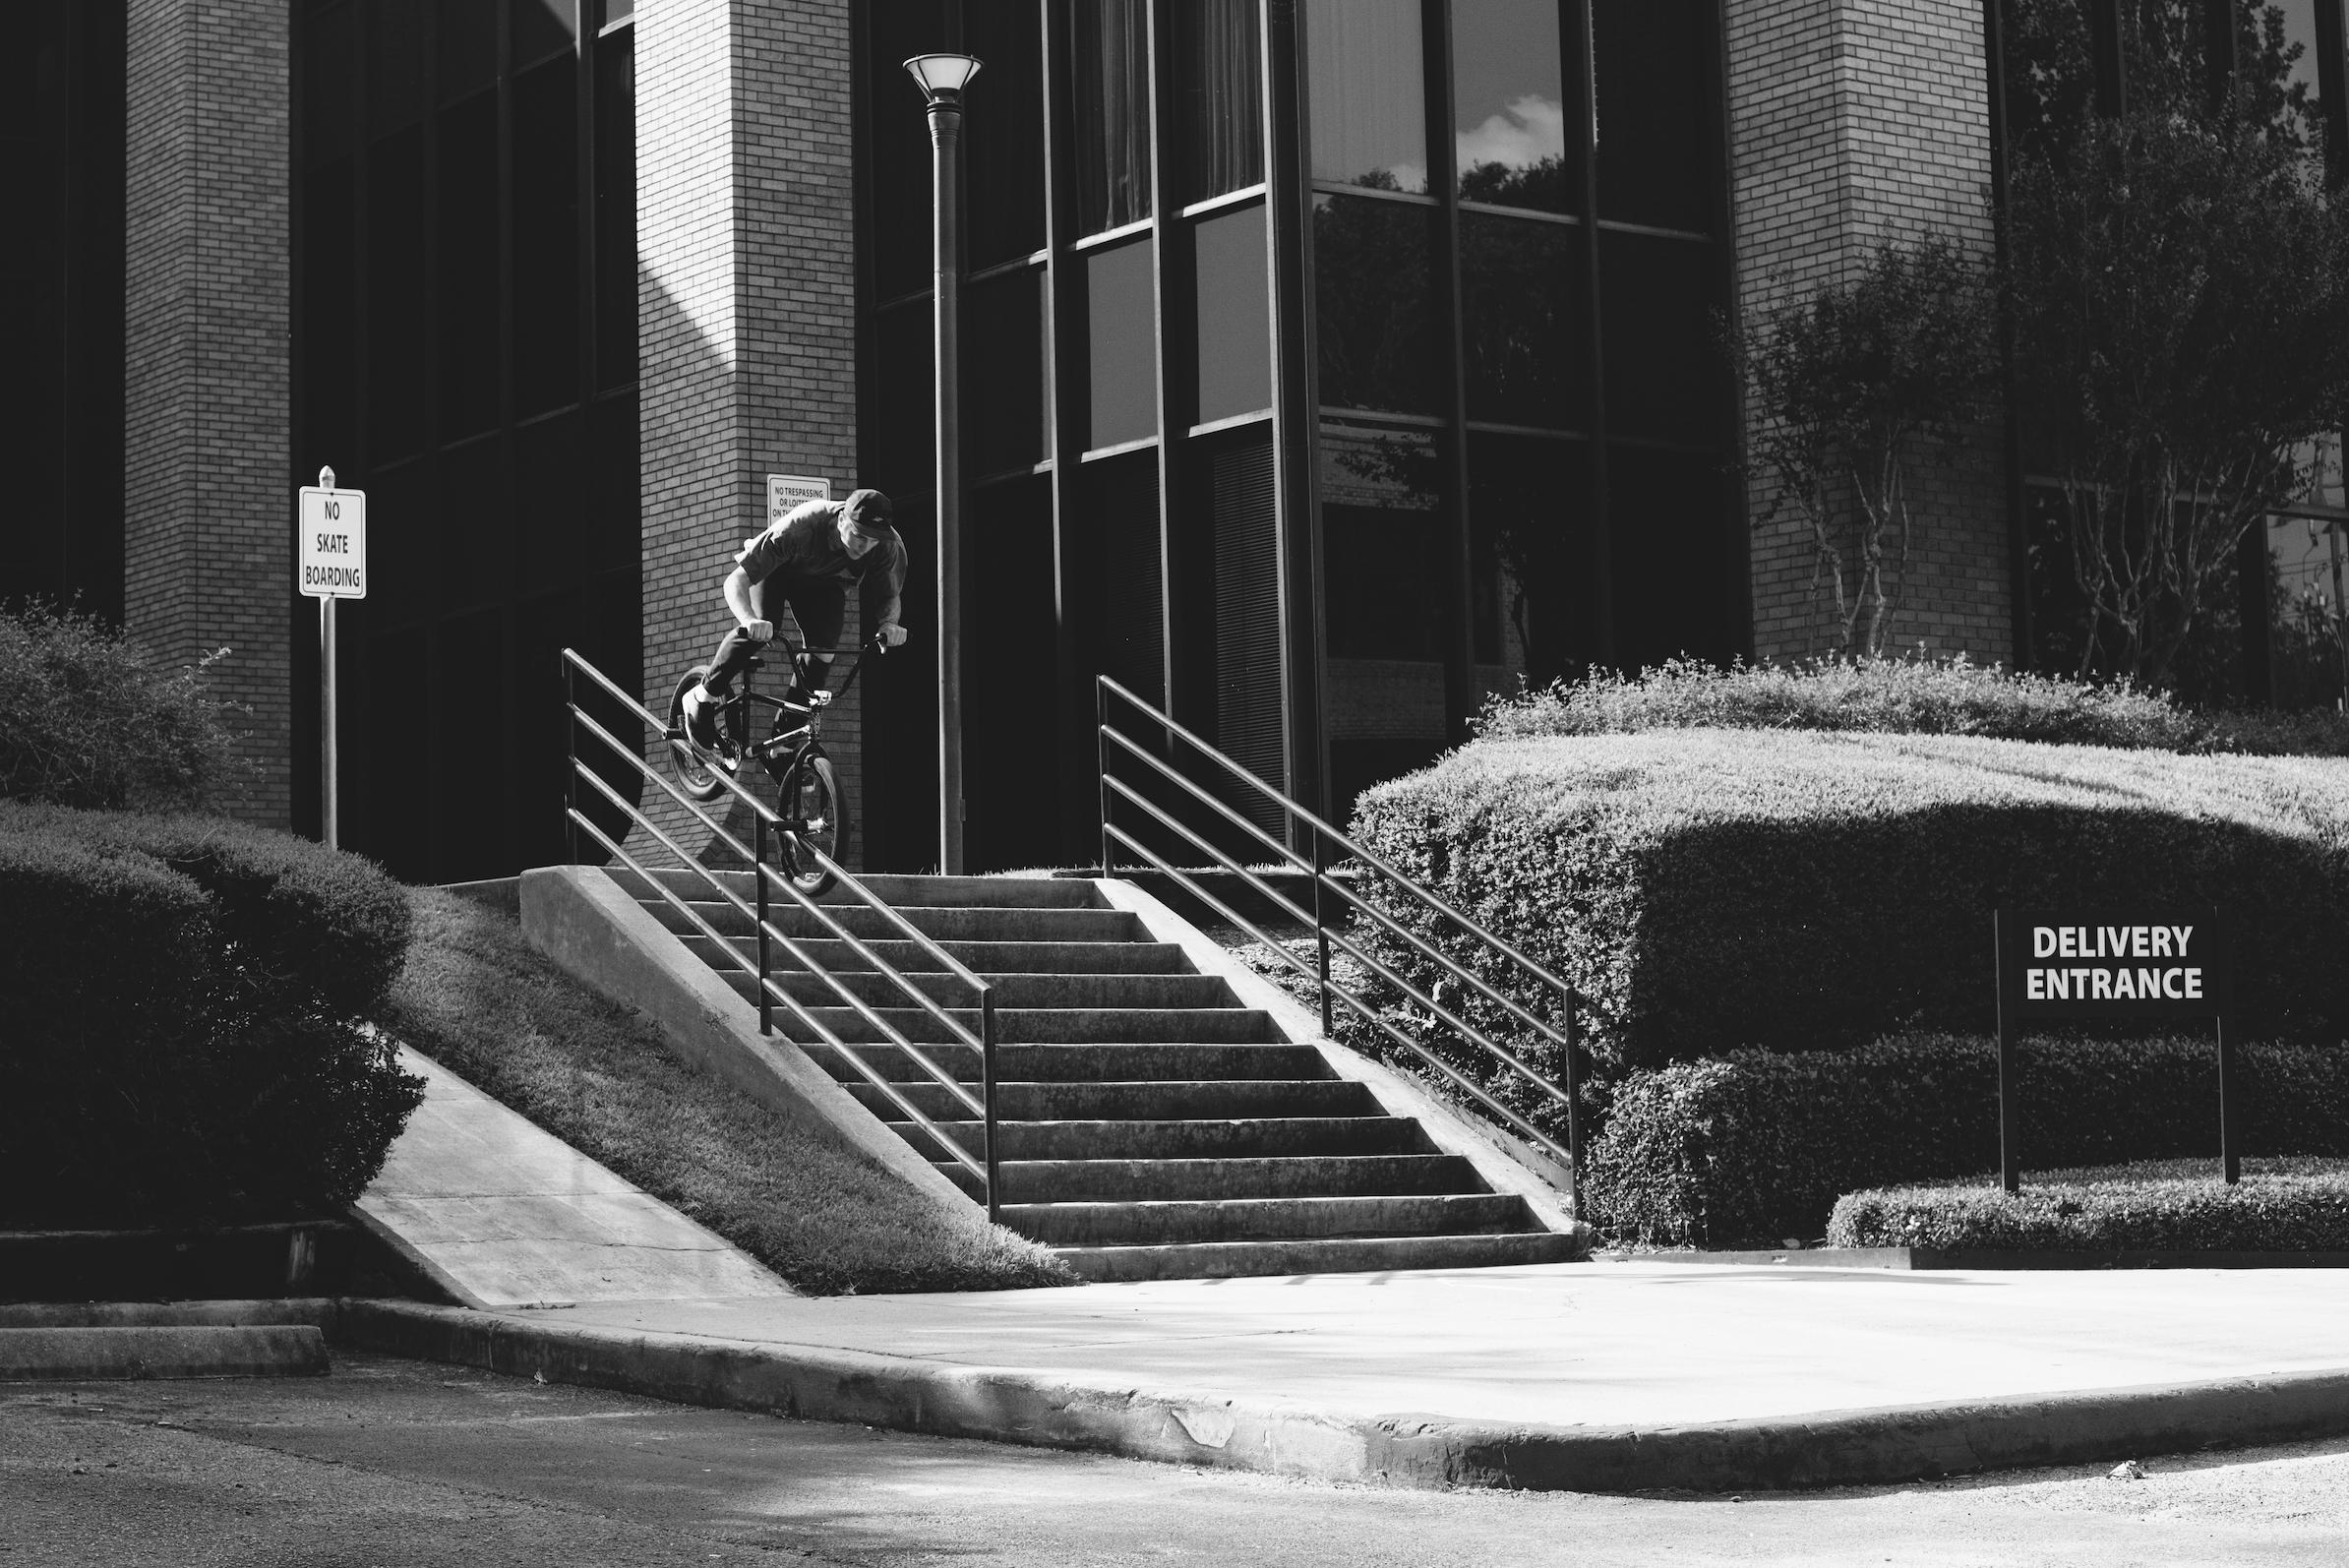 20171001 sunday street ride Kirby Crumpler_half res_2.jpg